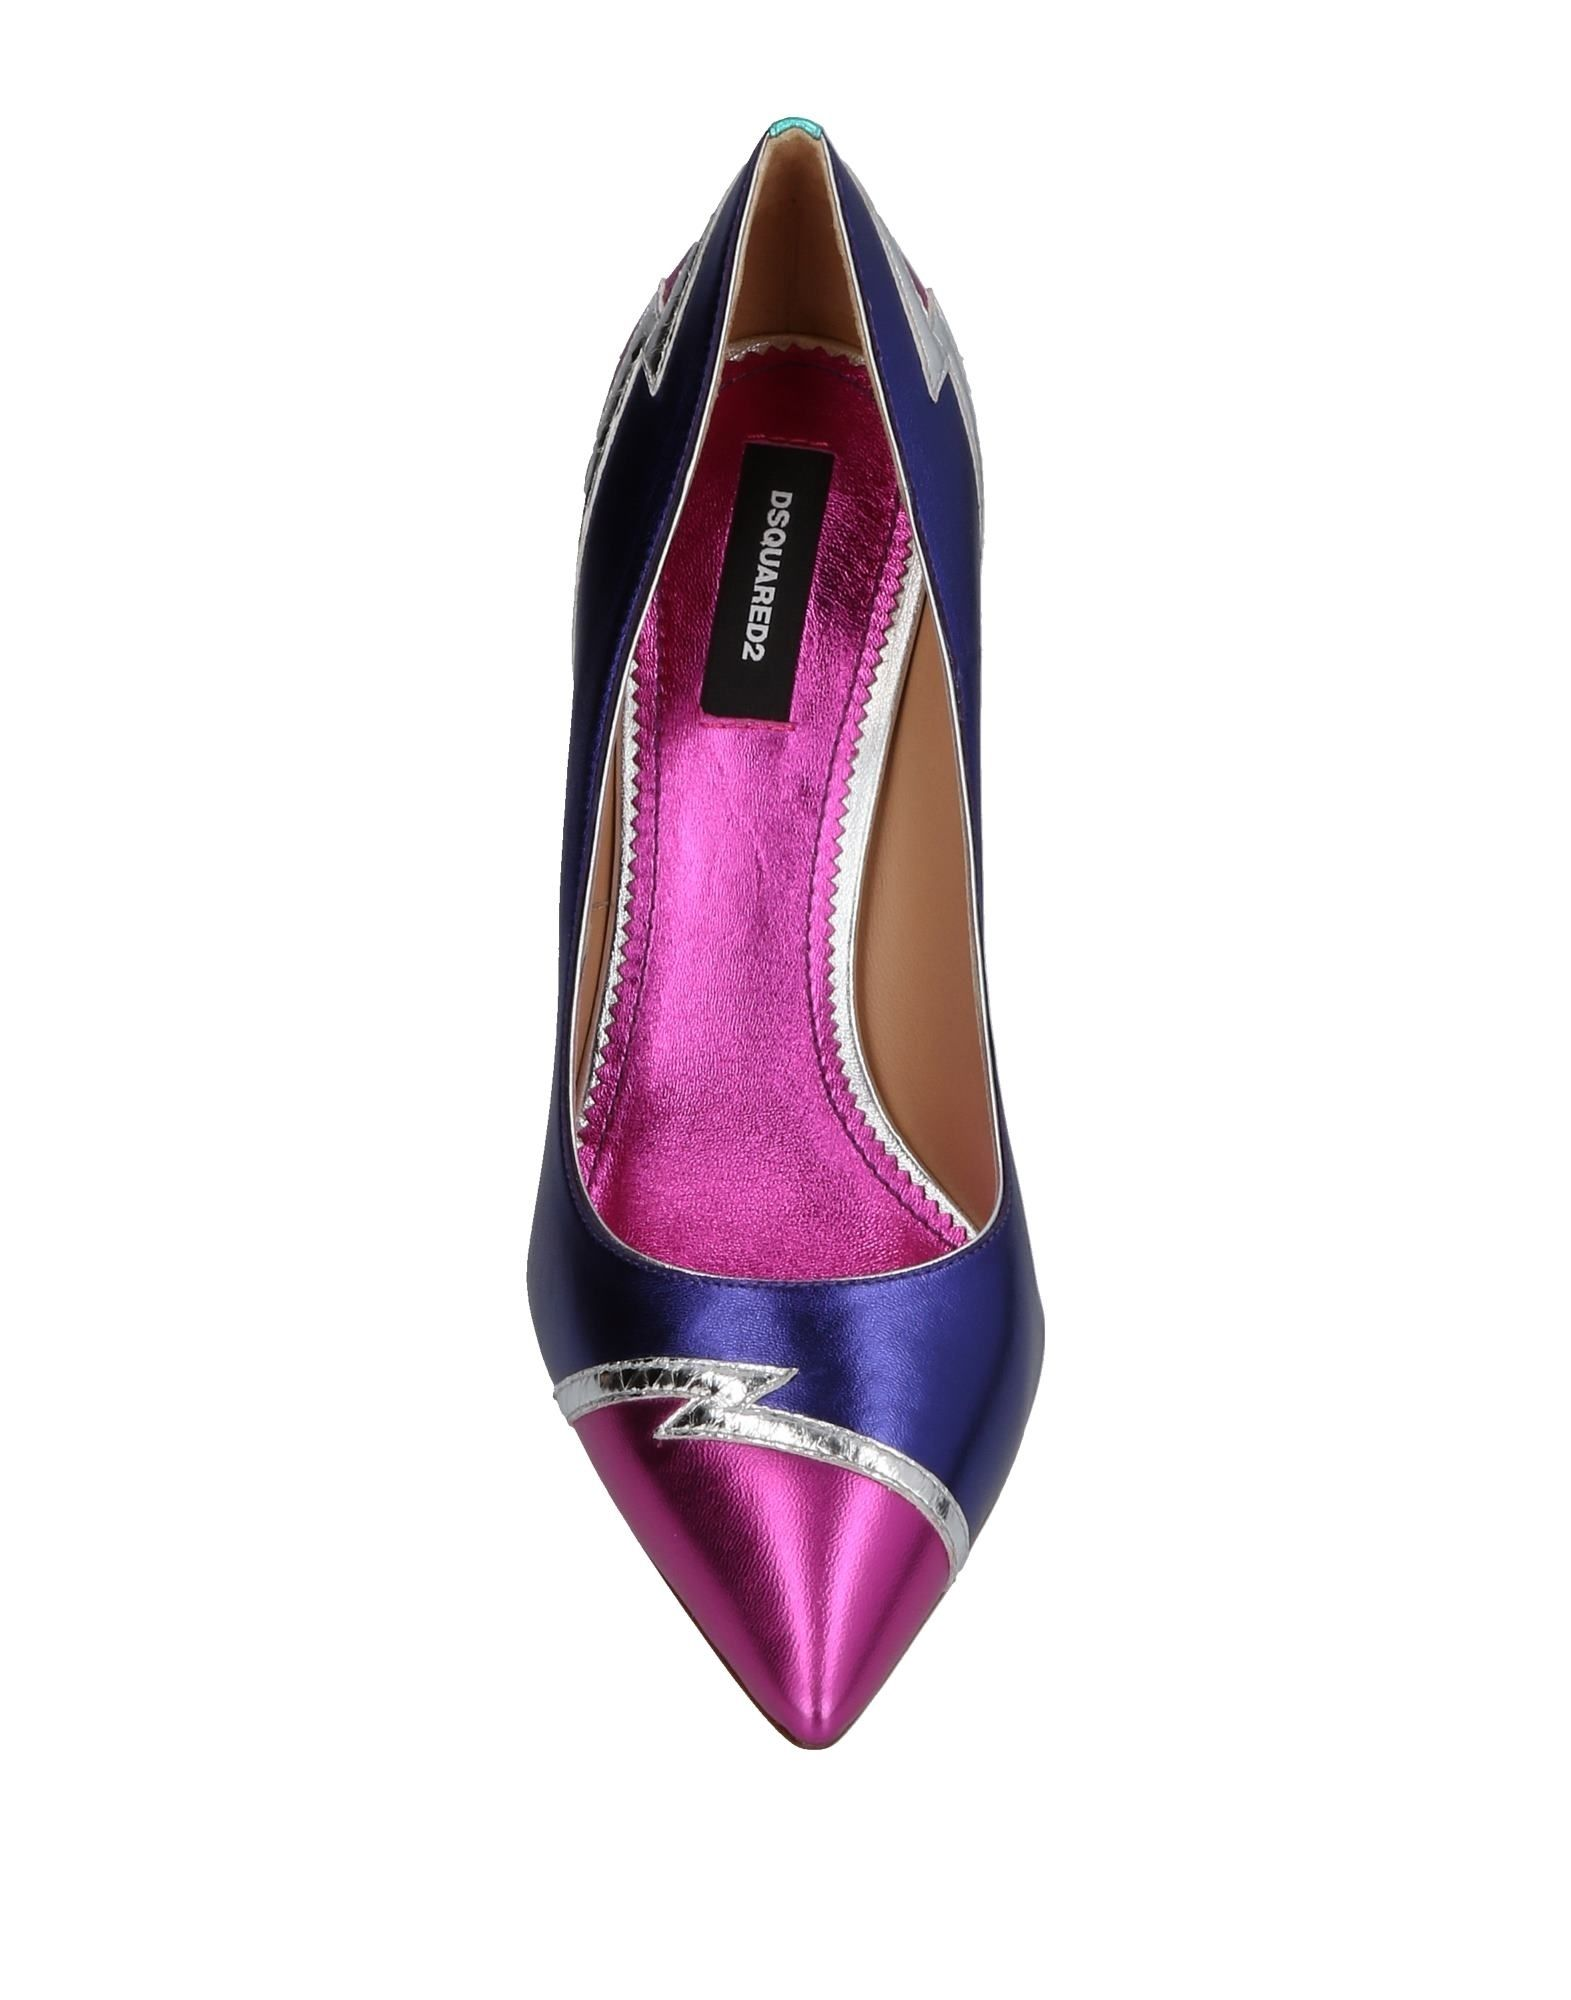 Dsquared2 Pumps aussehende Damen  11423226JBGünstige gut aussehende Pumps Schuhe 8b1729